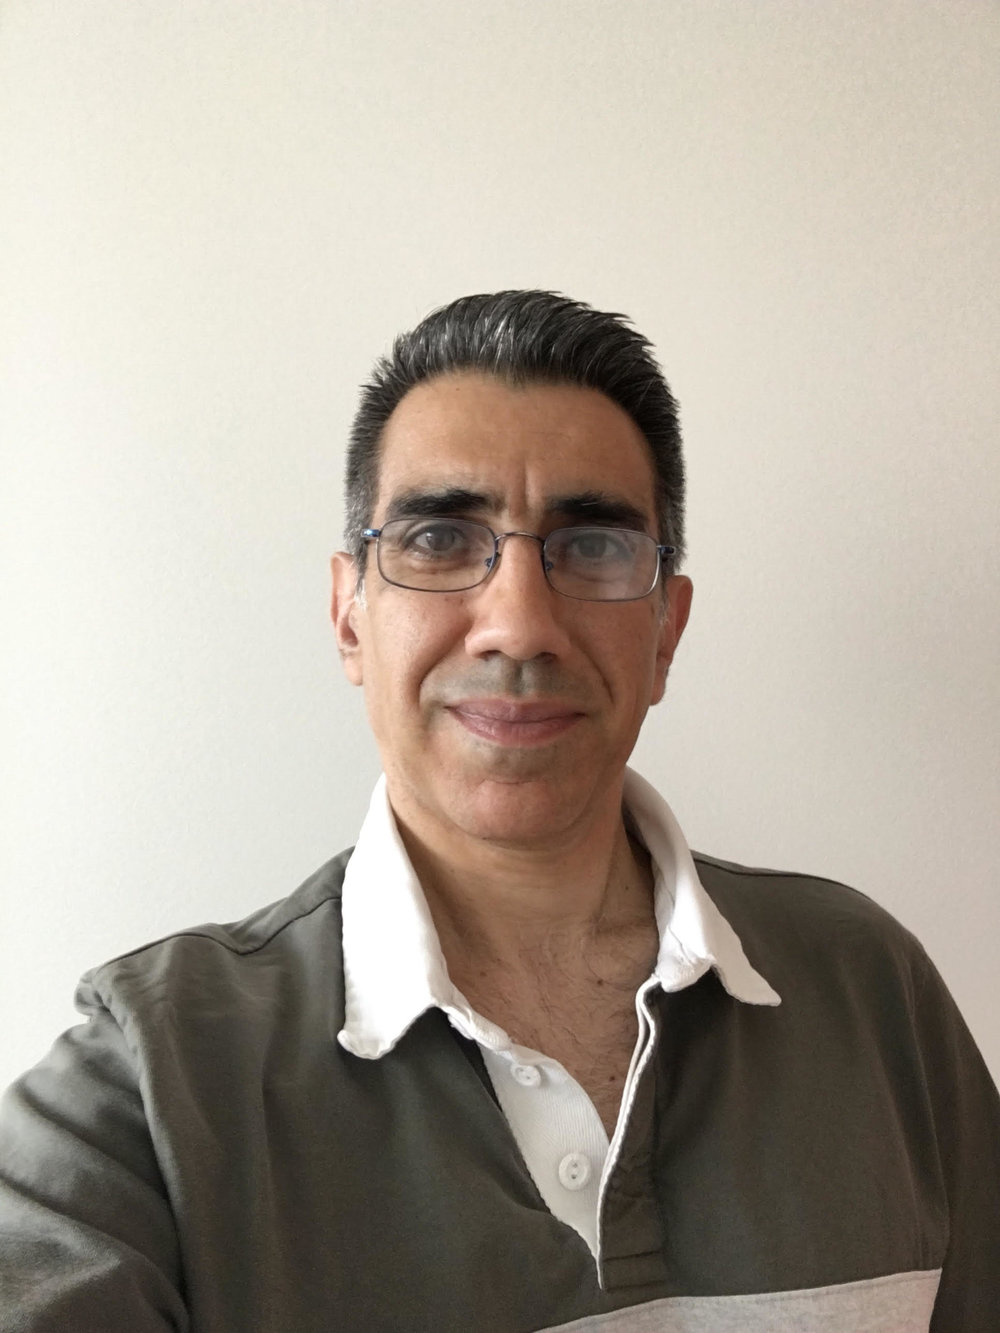 Nico Siciliano, Tuesday